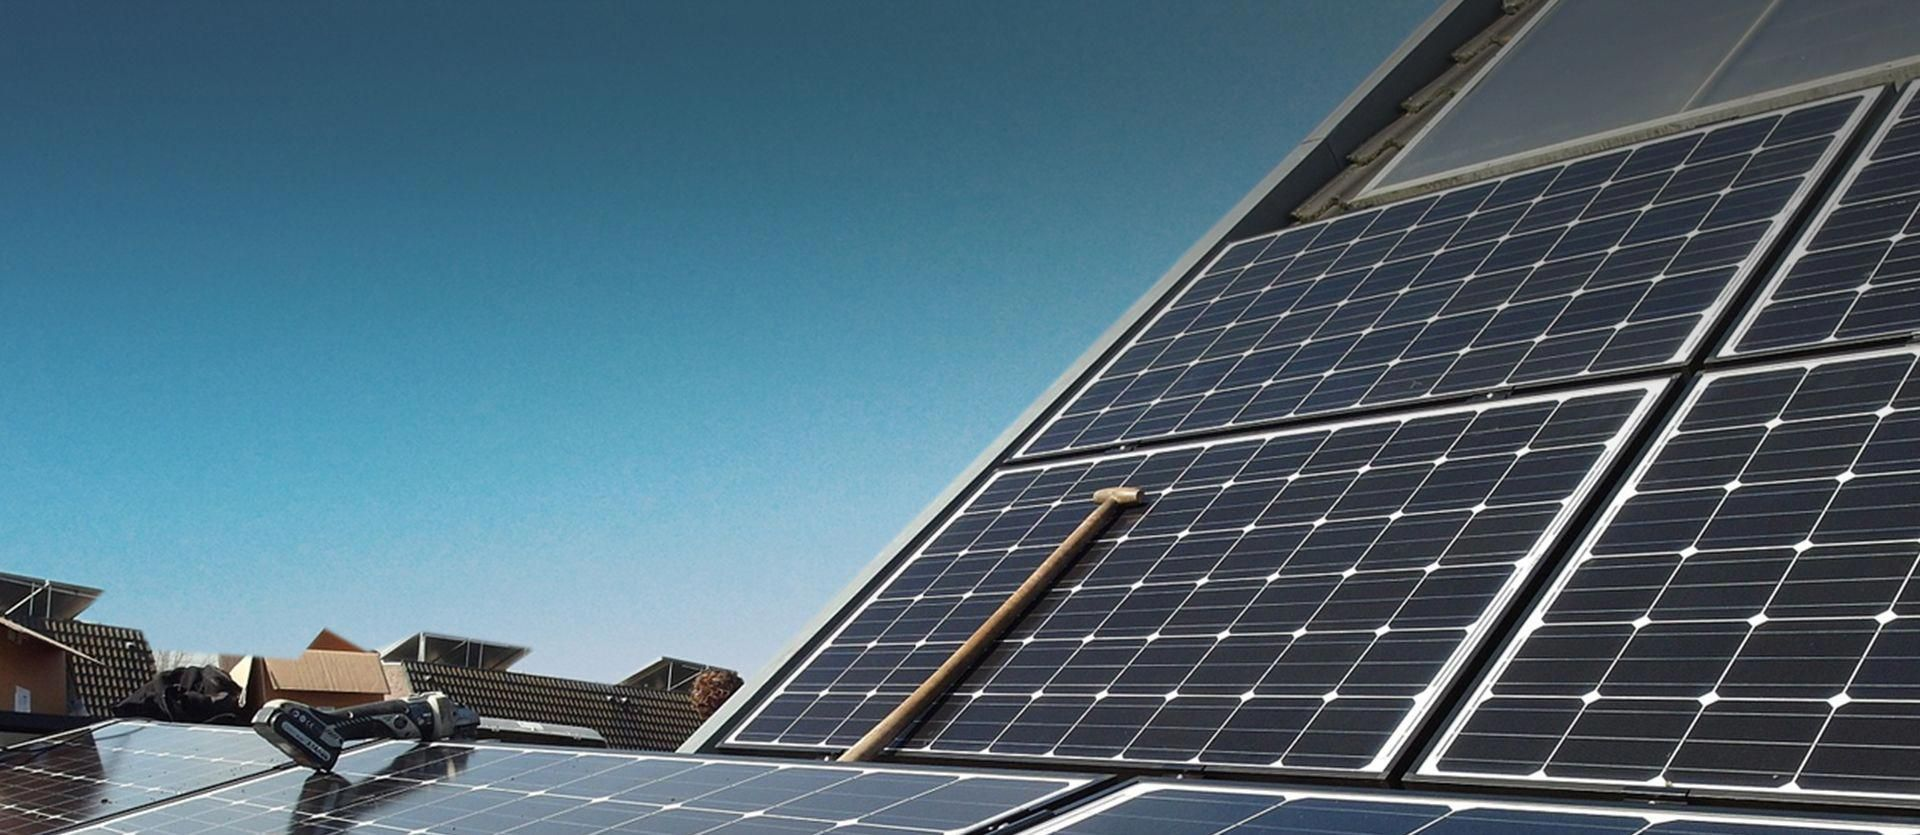 solar solarpanels,solarenergy,solarpower,solargenerator